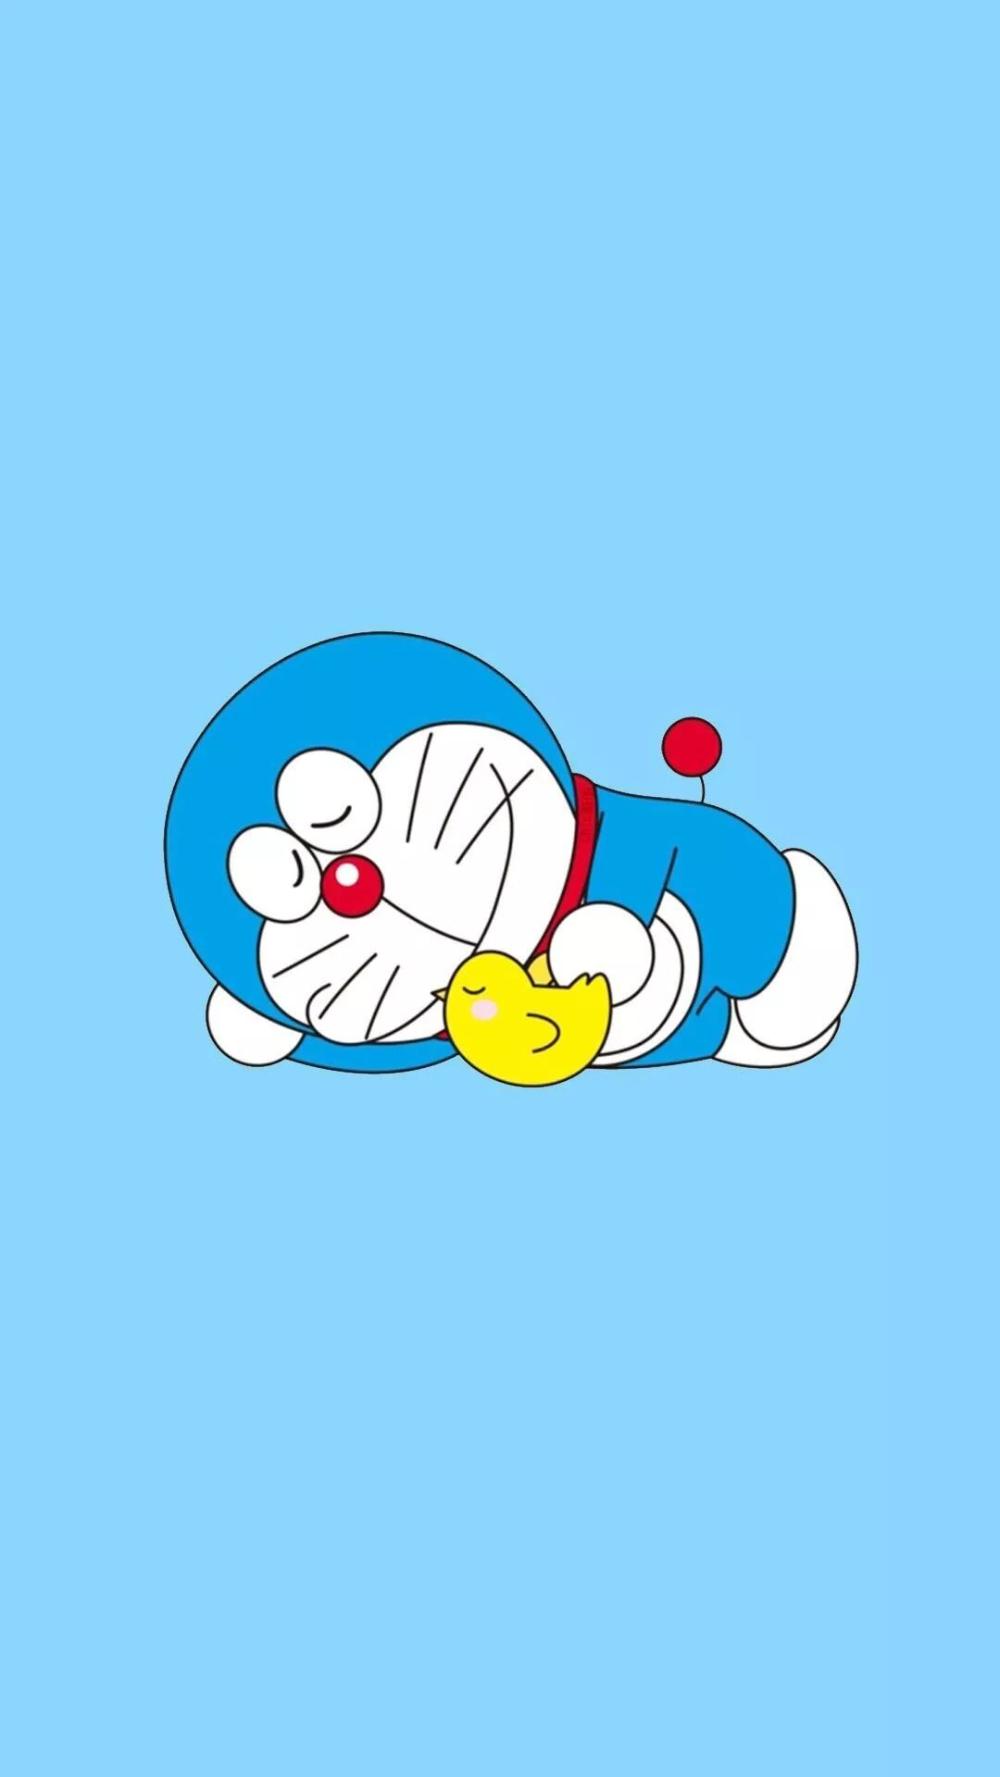 Cute Blue Doraemon Wallpaper For Iphone